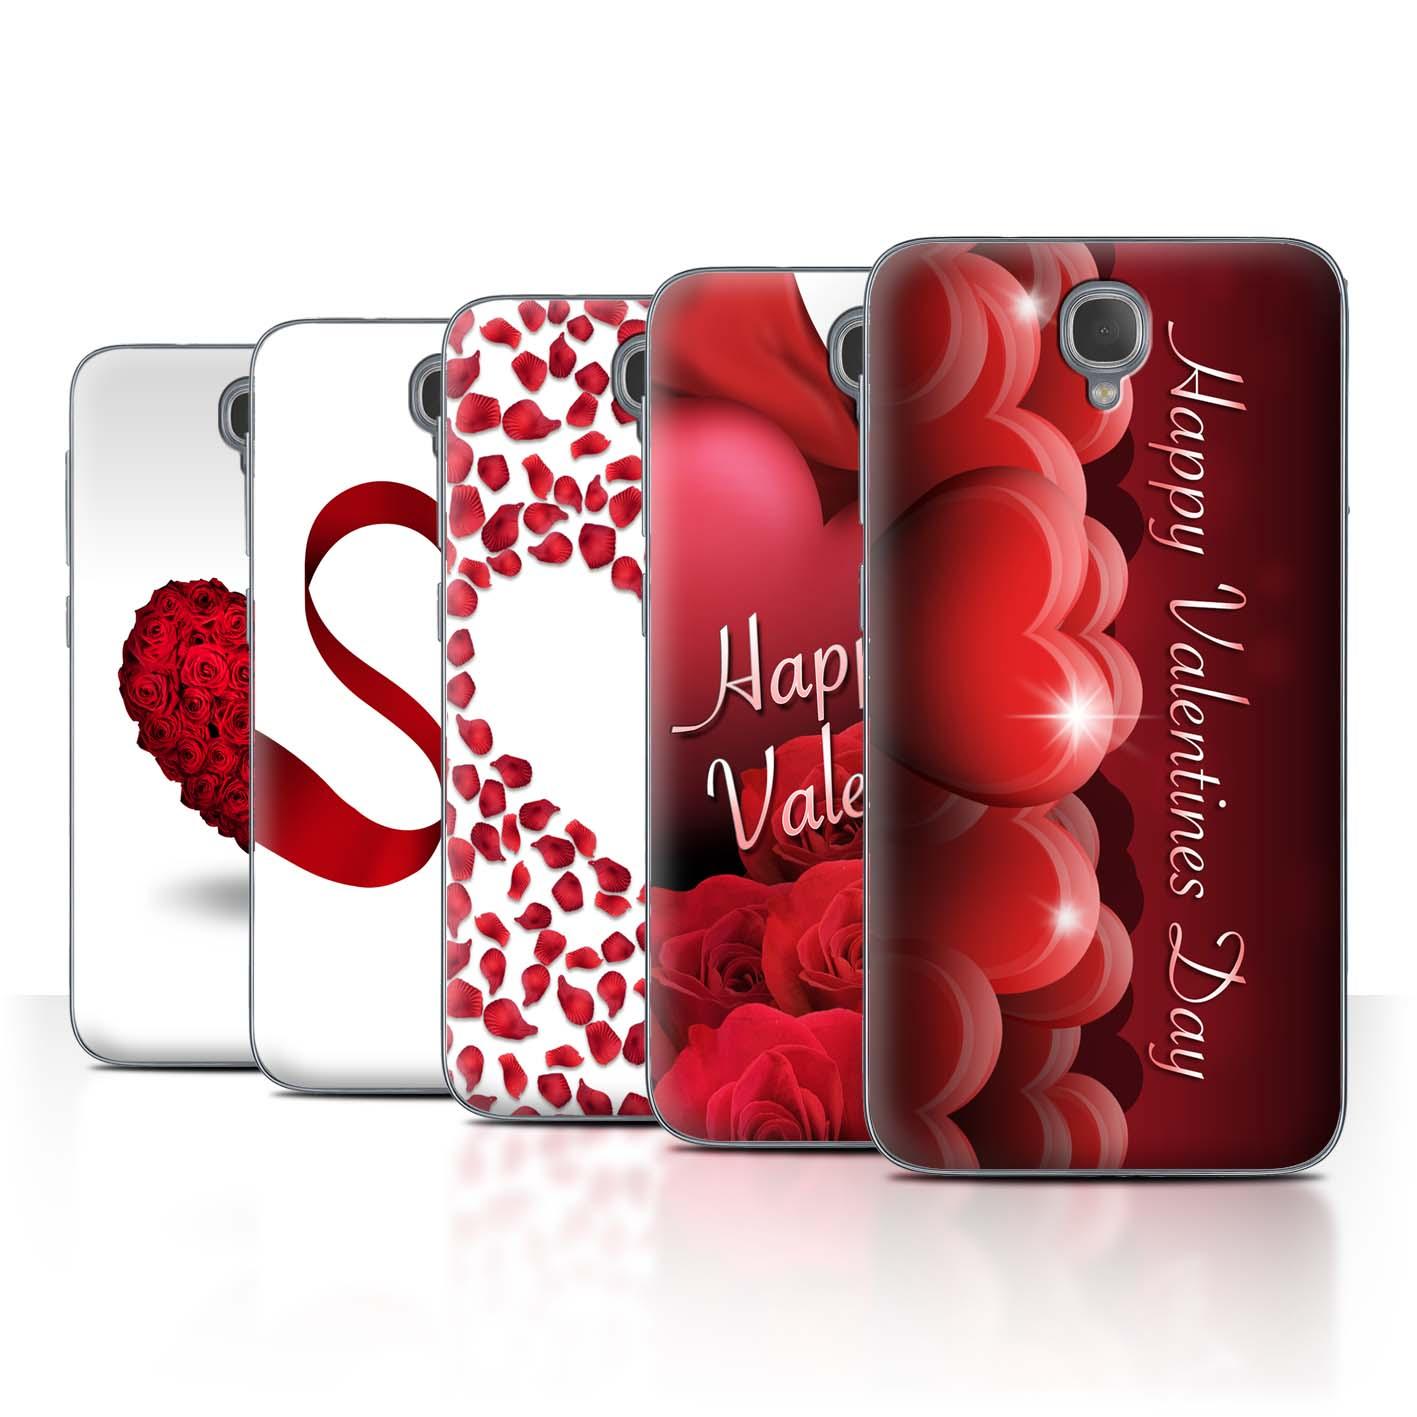 STUFF4-Back-Case-Cover-Skin-for-Alcatel-Idol-2-Valentine-Heart